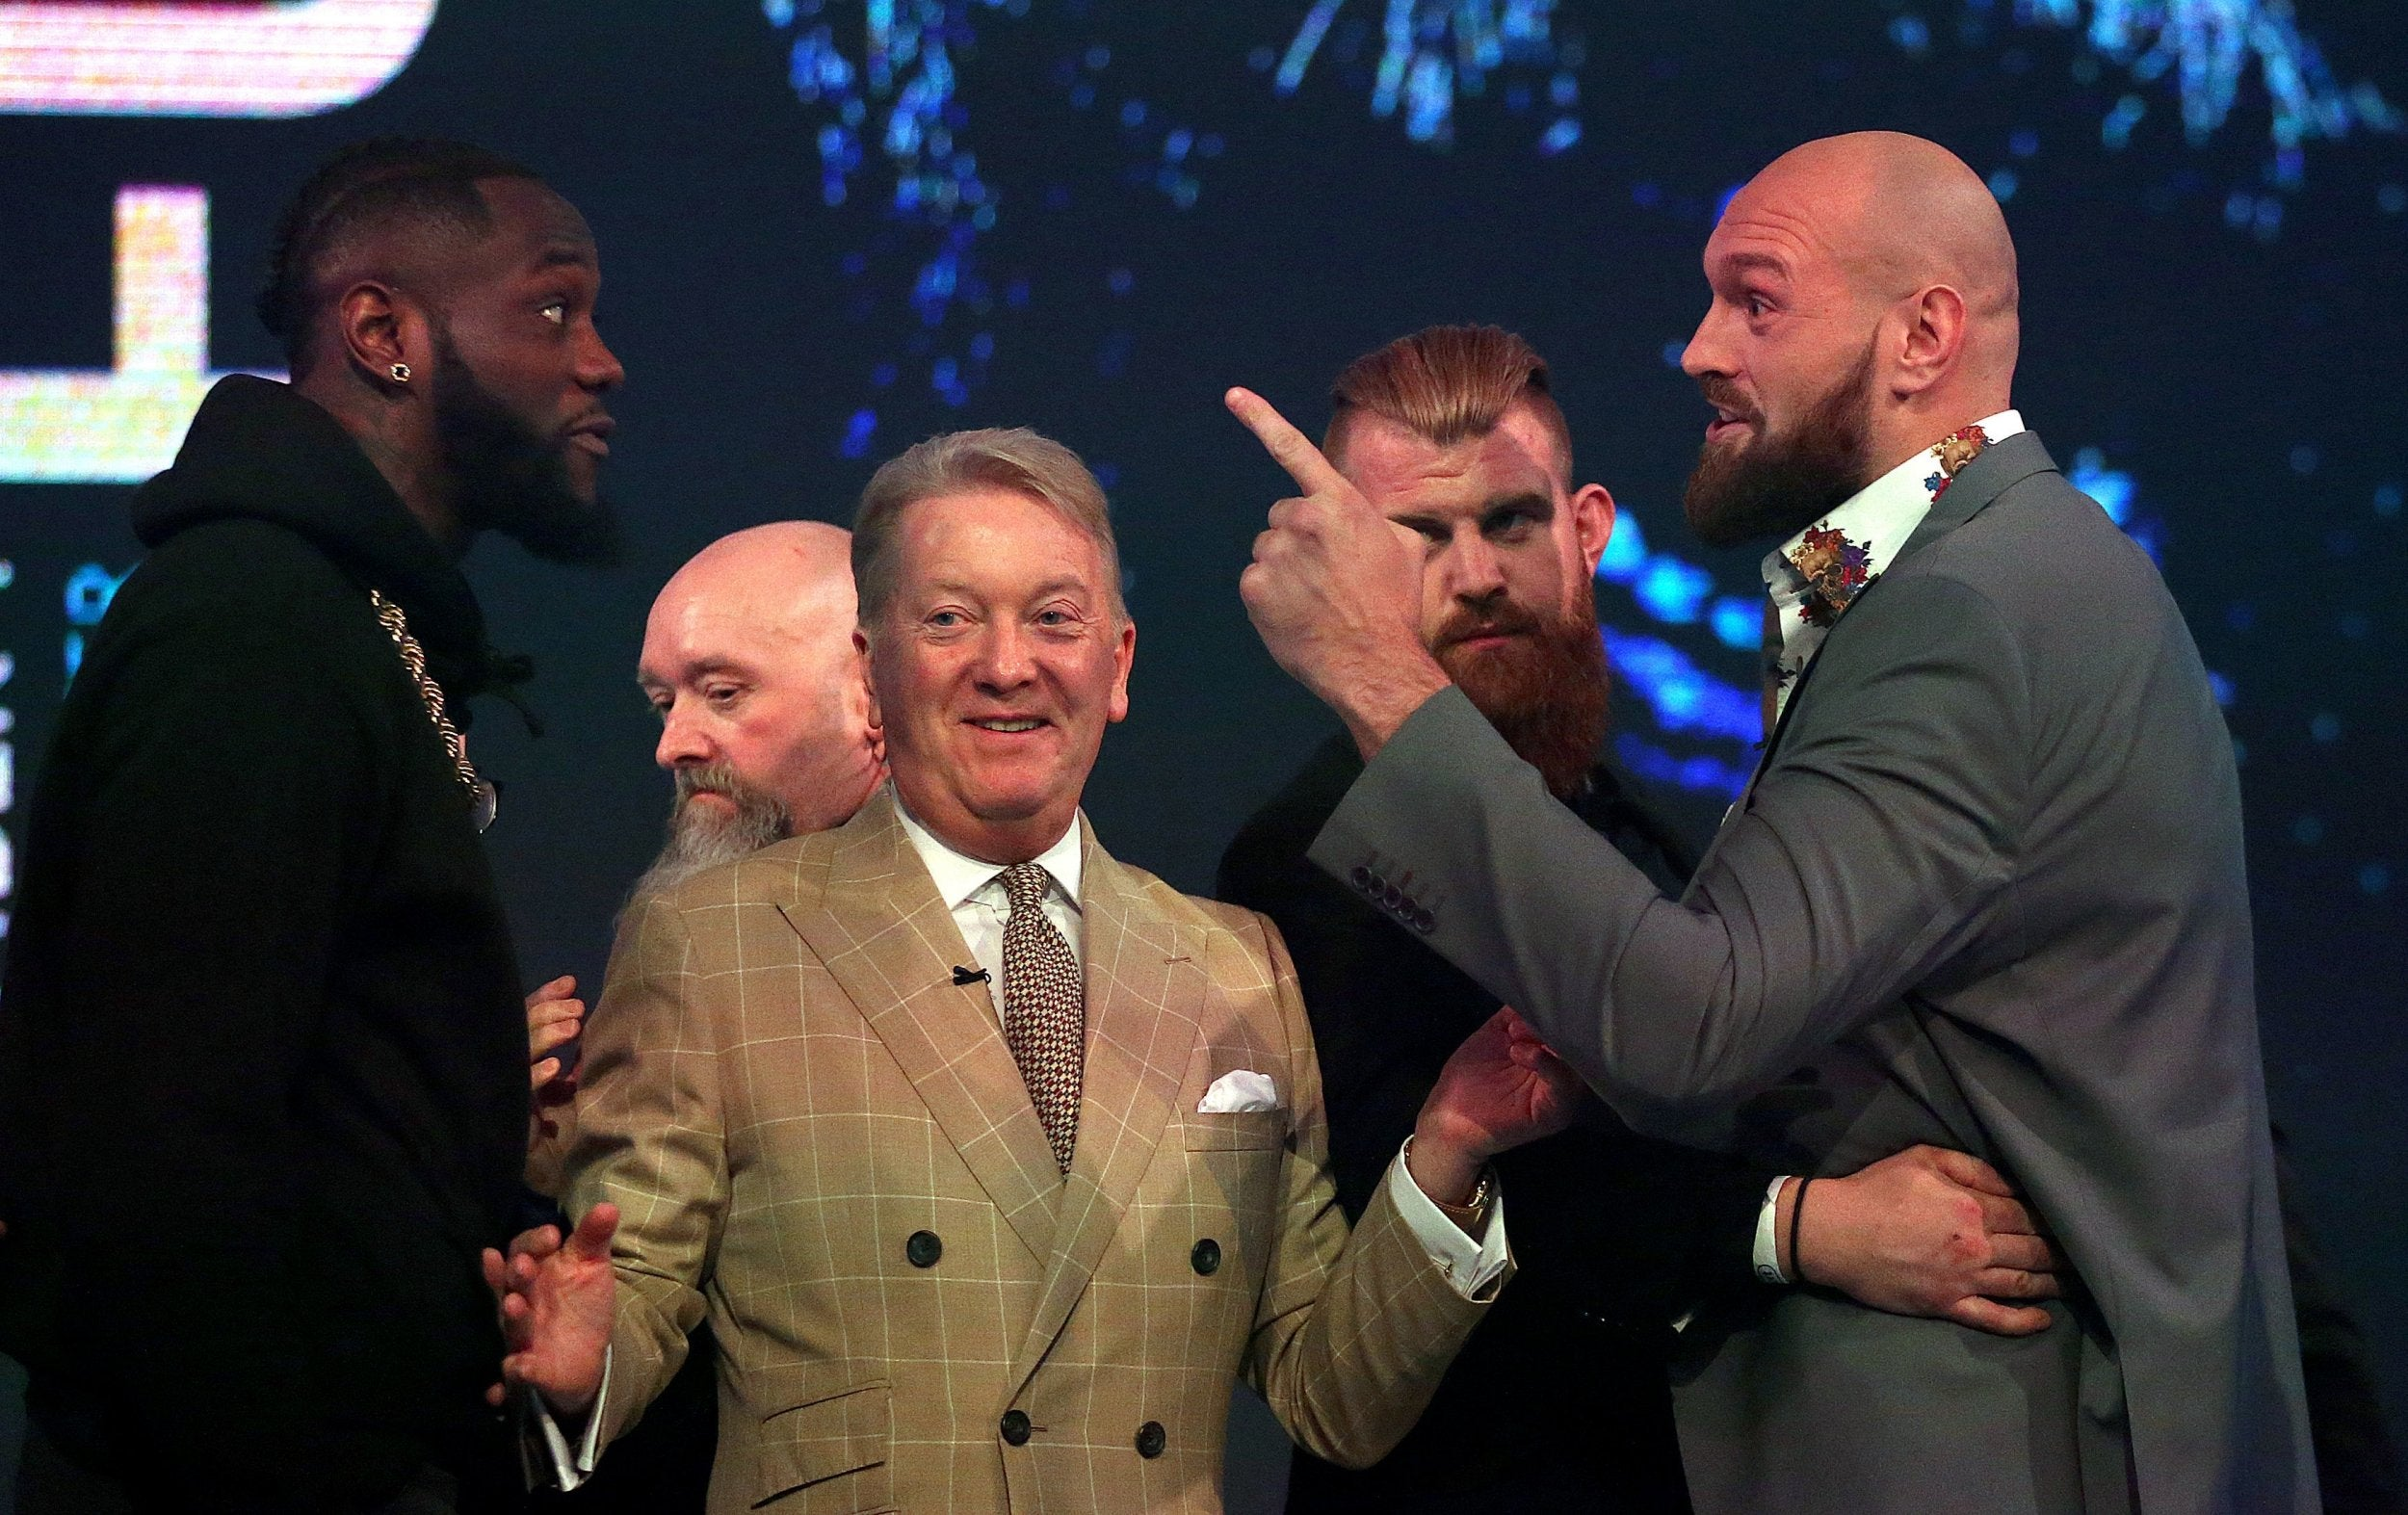 Tyson Fury vs Deontay Wilder: 'Gypsy King' is already a winner regardless of outcome in Los Angeles